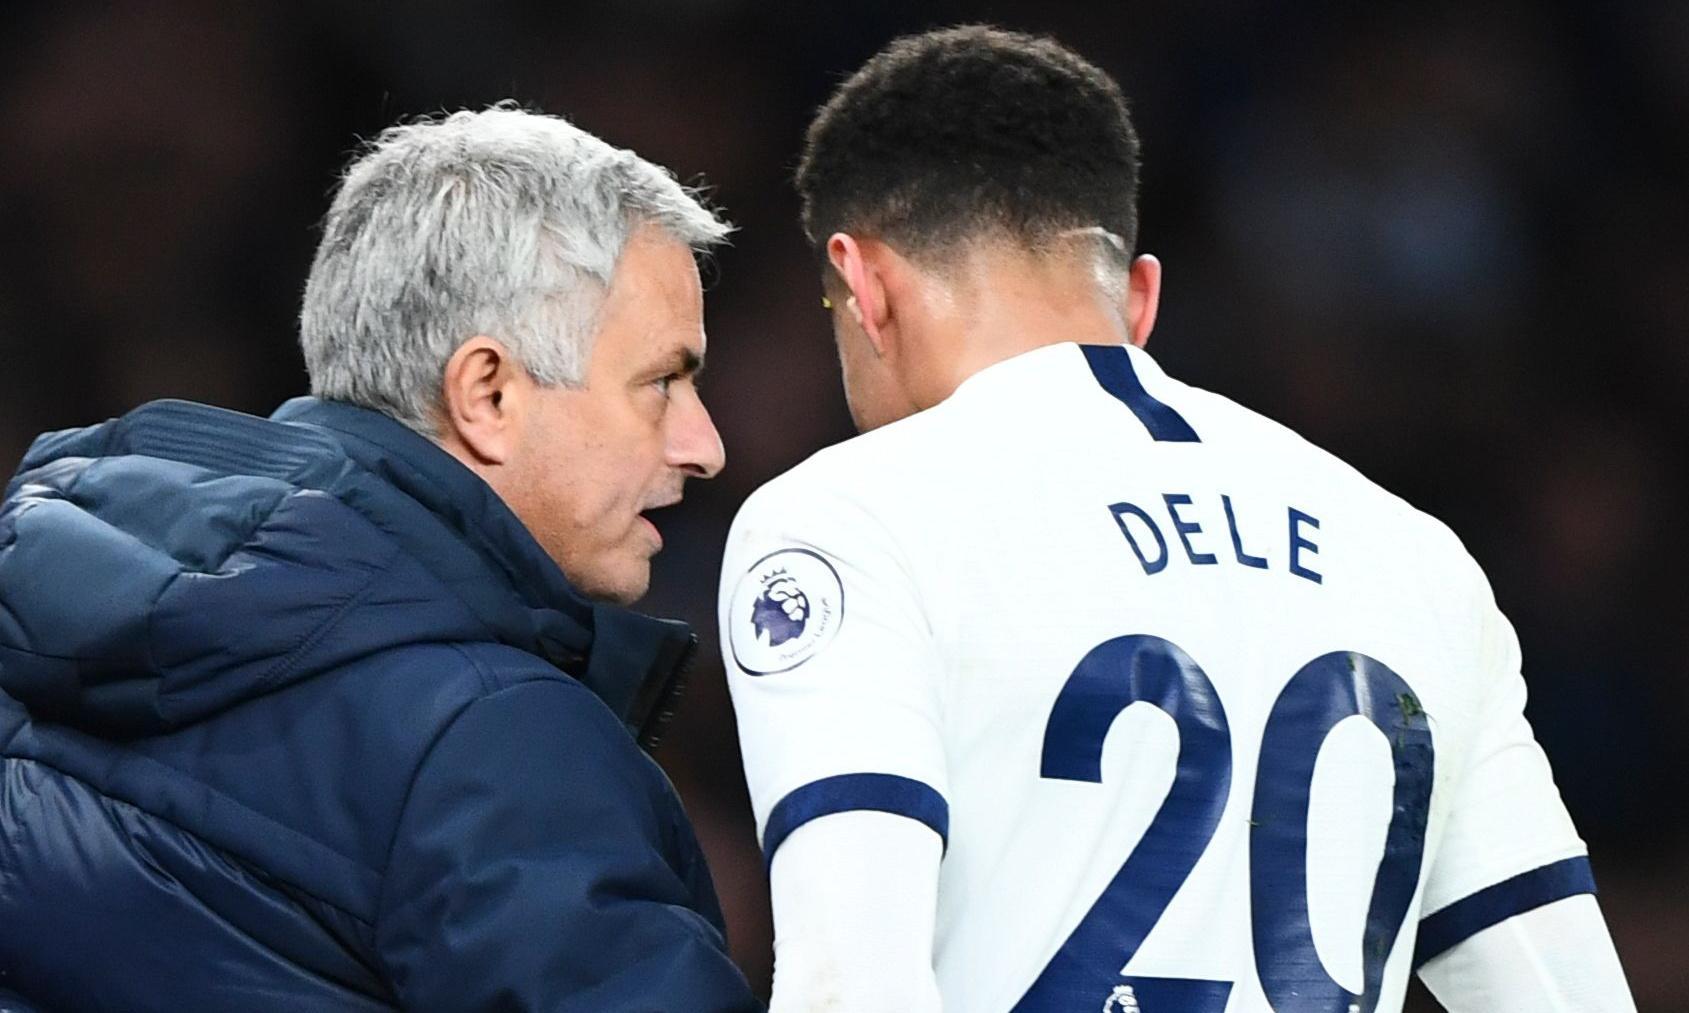 José Mourinho says FA should not punish Dele Alli over coronavirus video